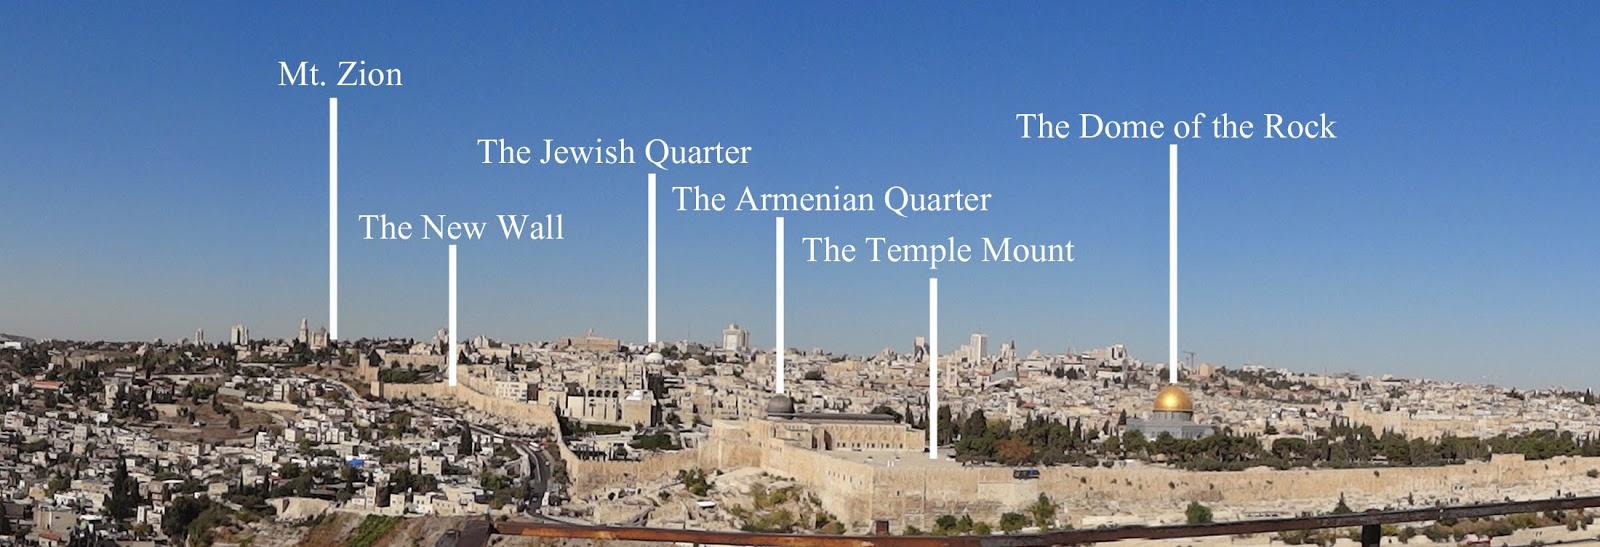 http://1.bp.blogspot.com/-dFY2ZxNpc7A/UnWZT2HwePI/AAAAAAAAFC0/gmo3XkQz2Es/s1600/Jerusalem+Labeled+copy.jpg